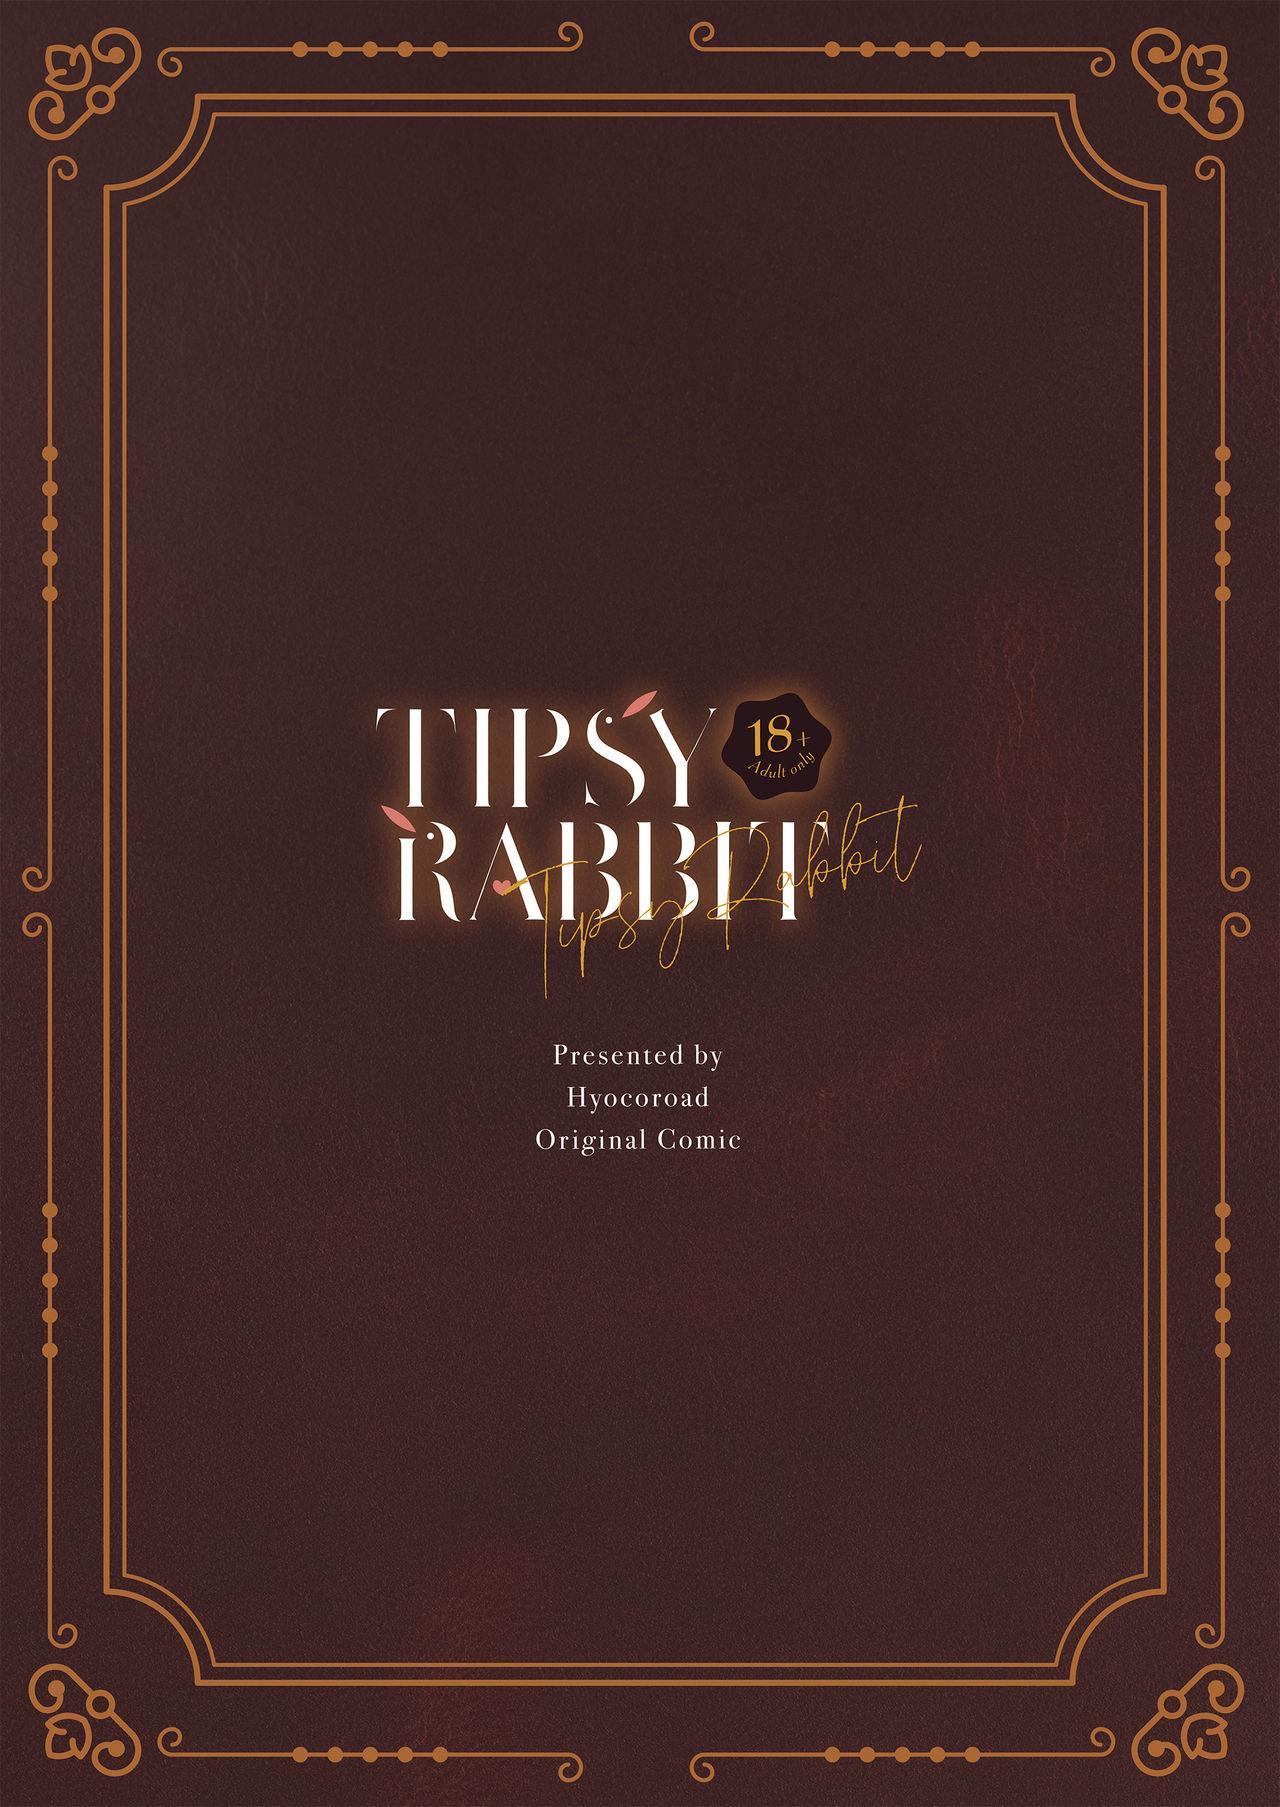 Tipsy Rabbit 38